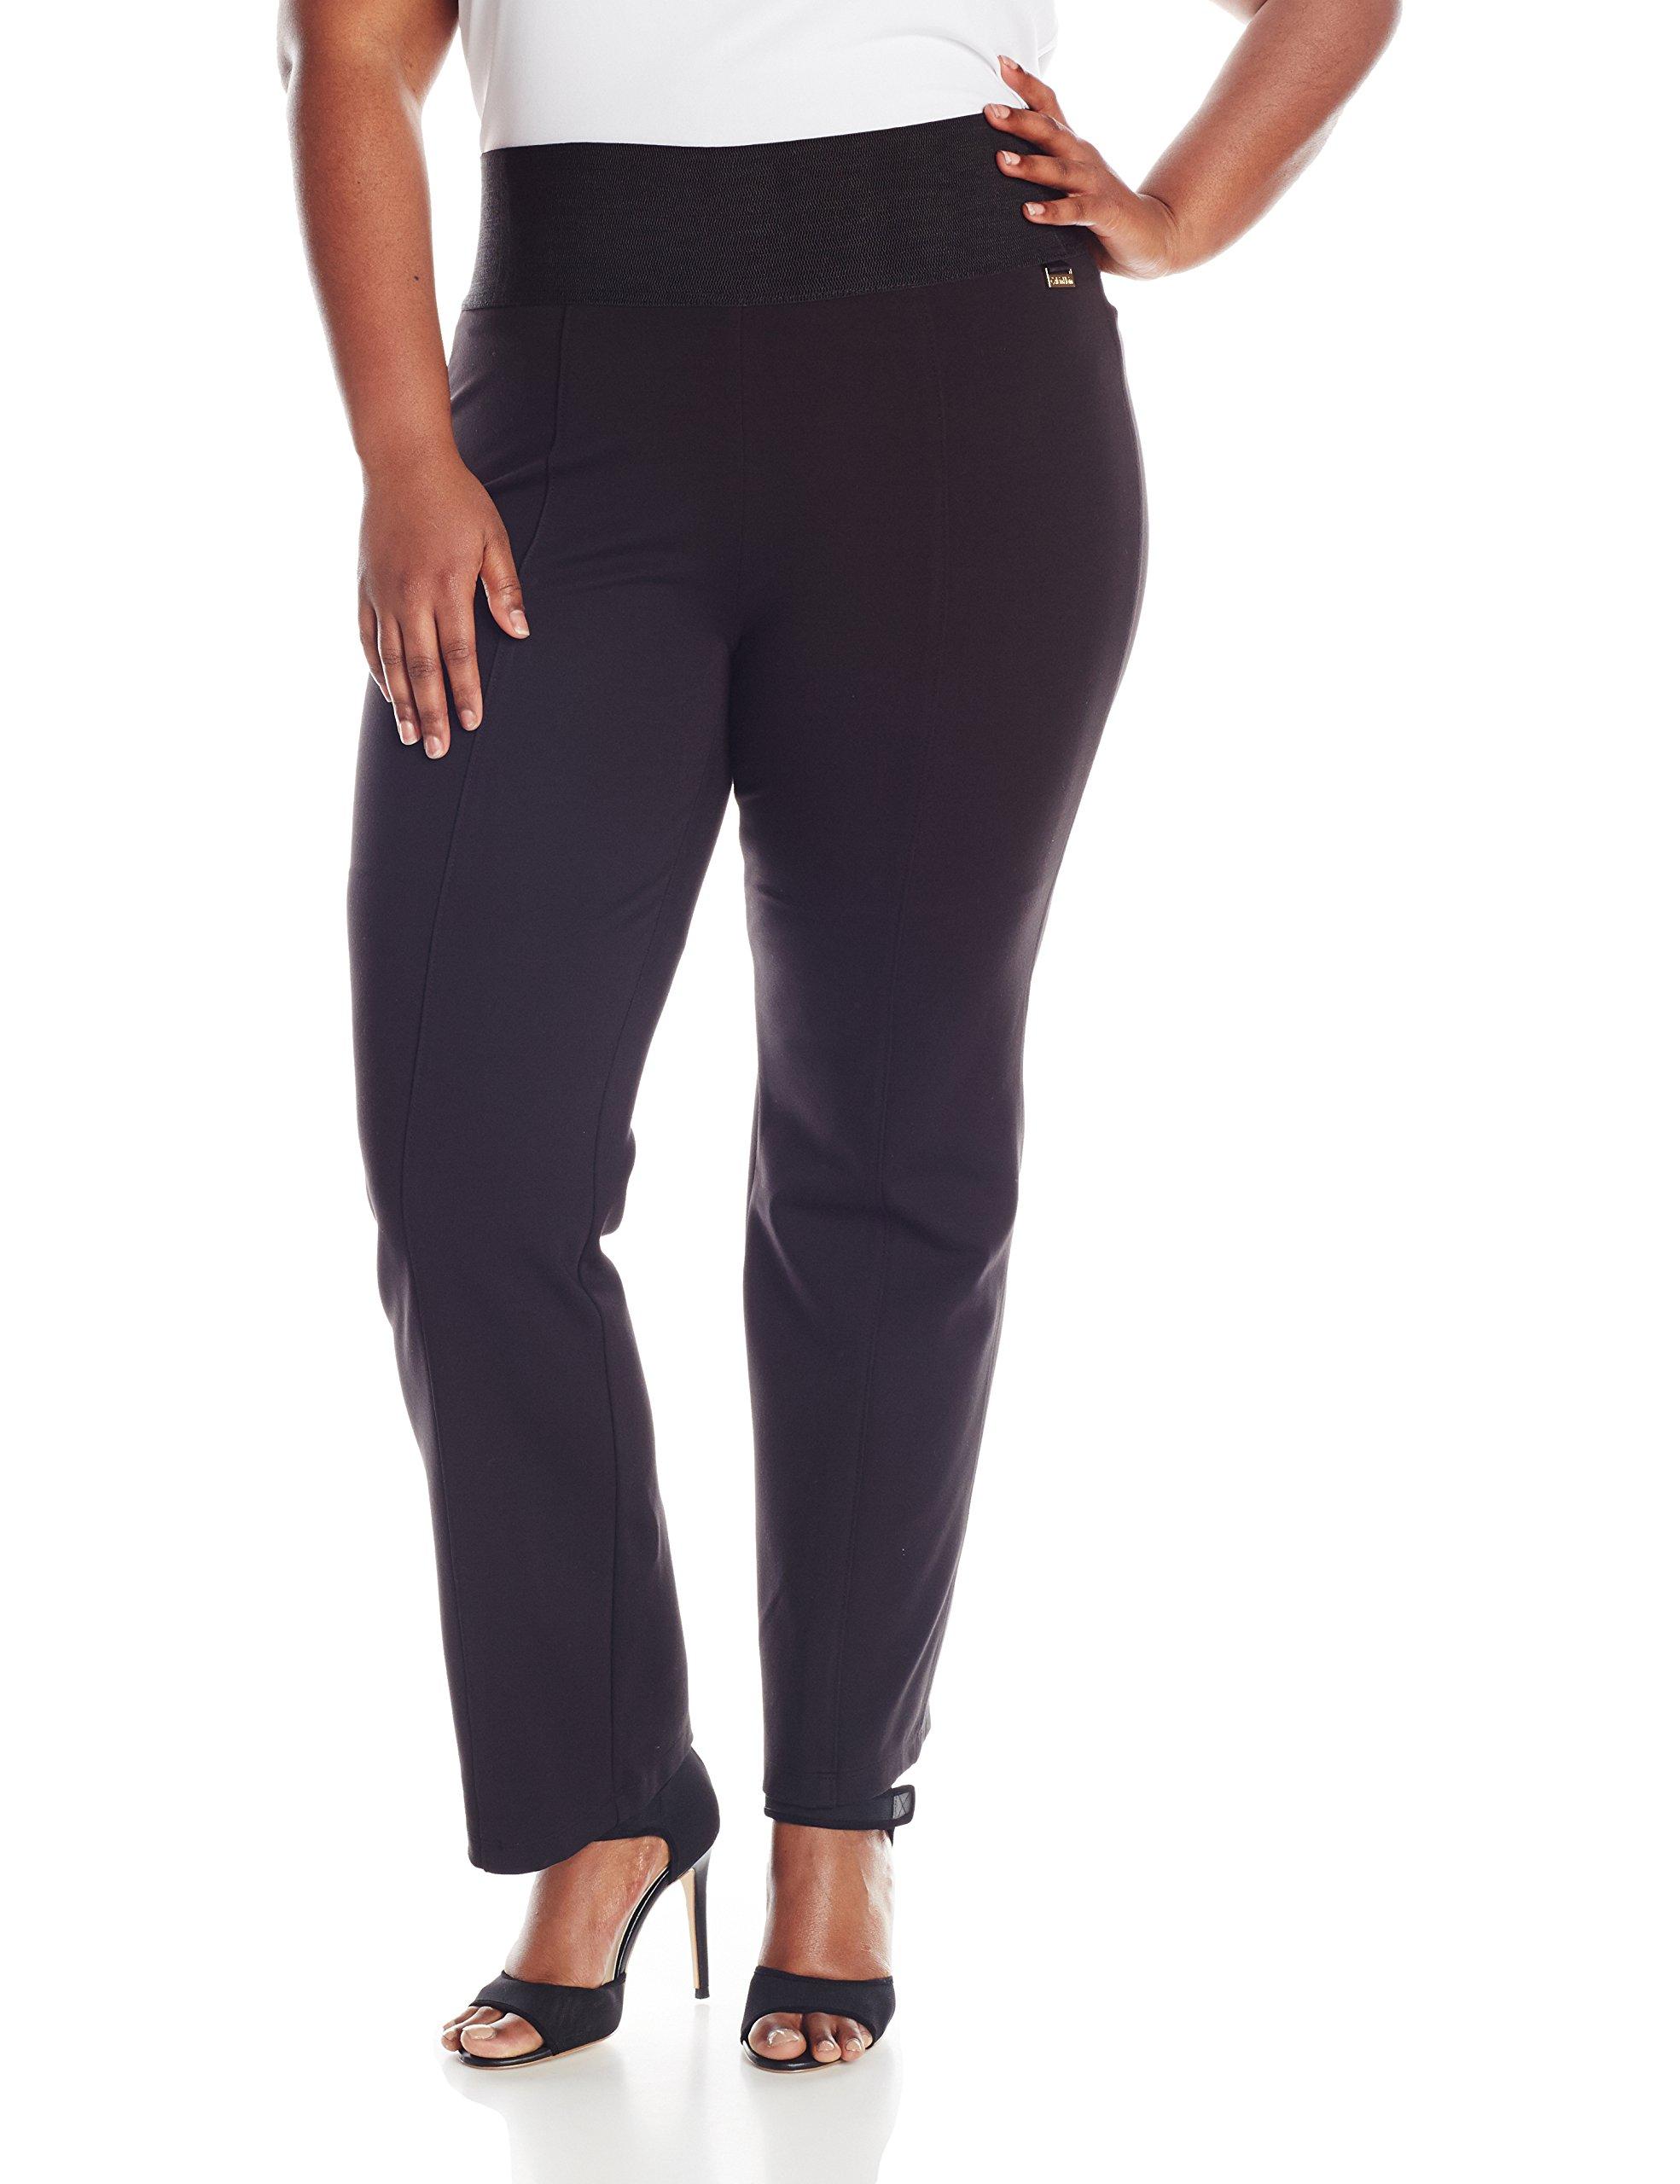 Calvin Klein Women's Power Stretch Pull On Straight Leg Pant (Regular and Plus Sizes)